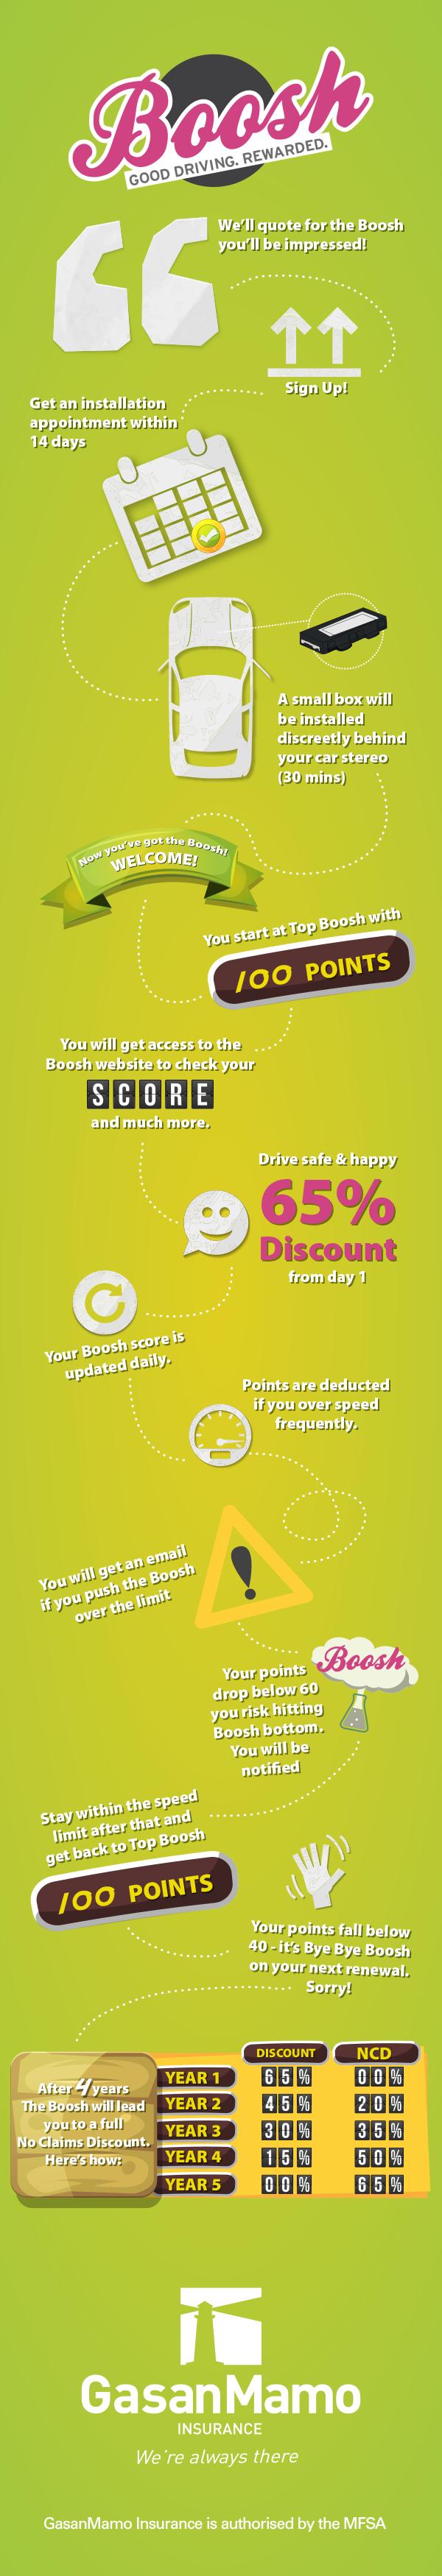 Boosh infographic